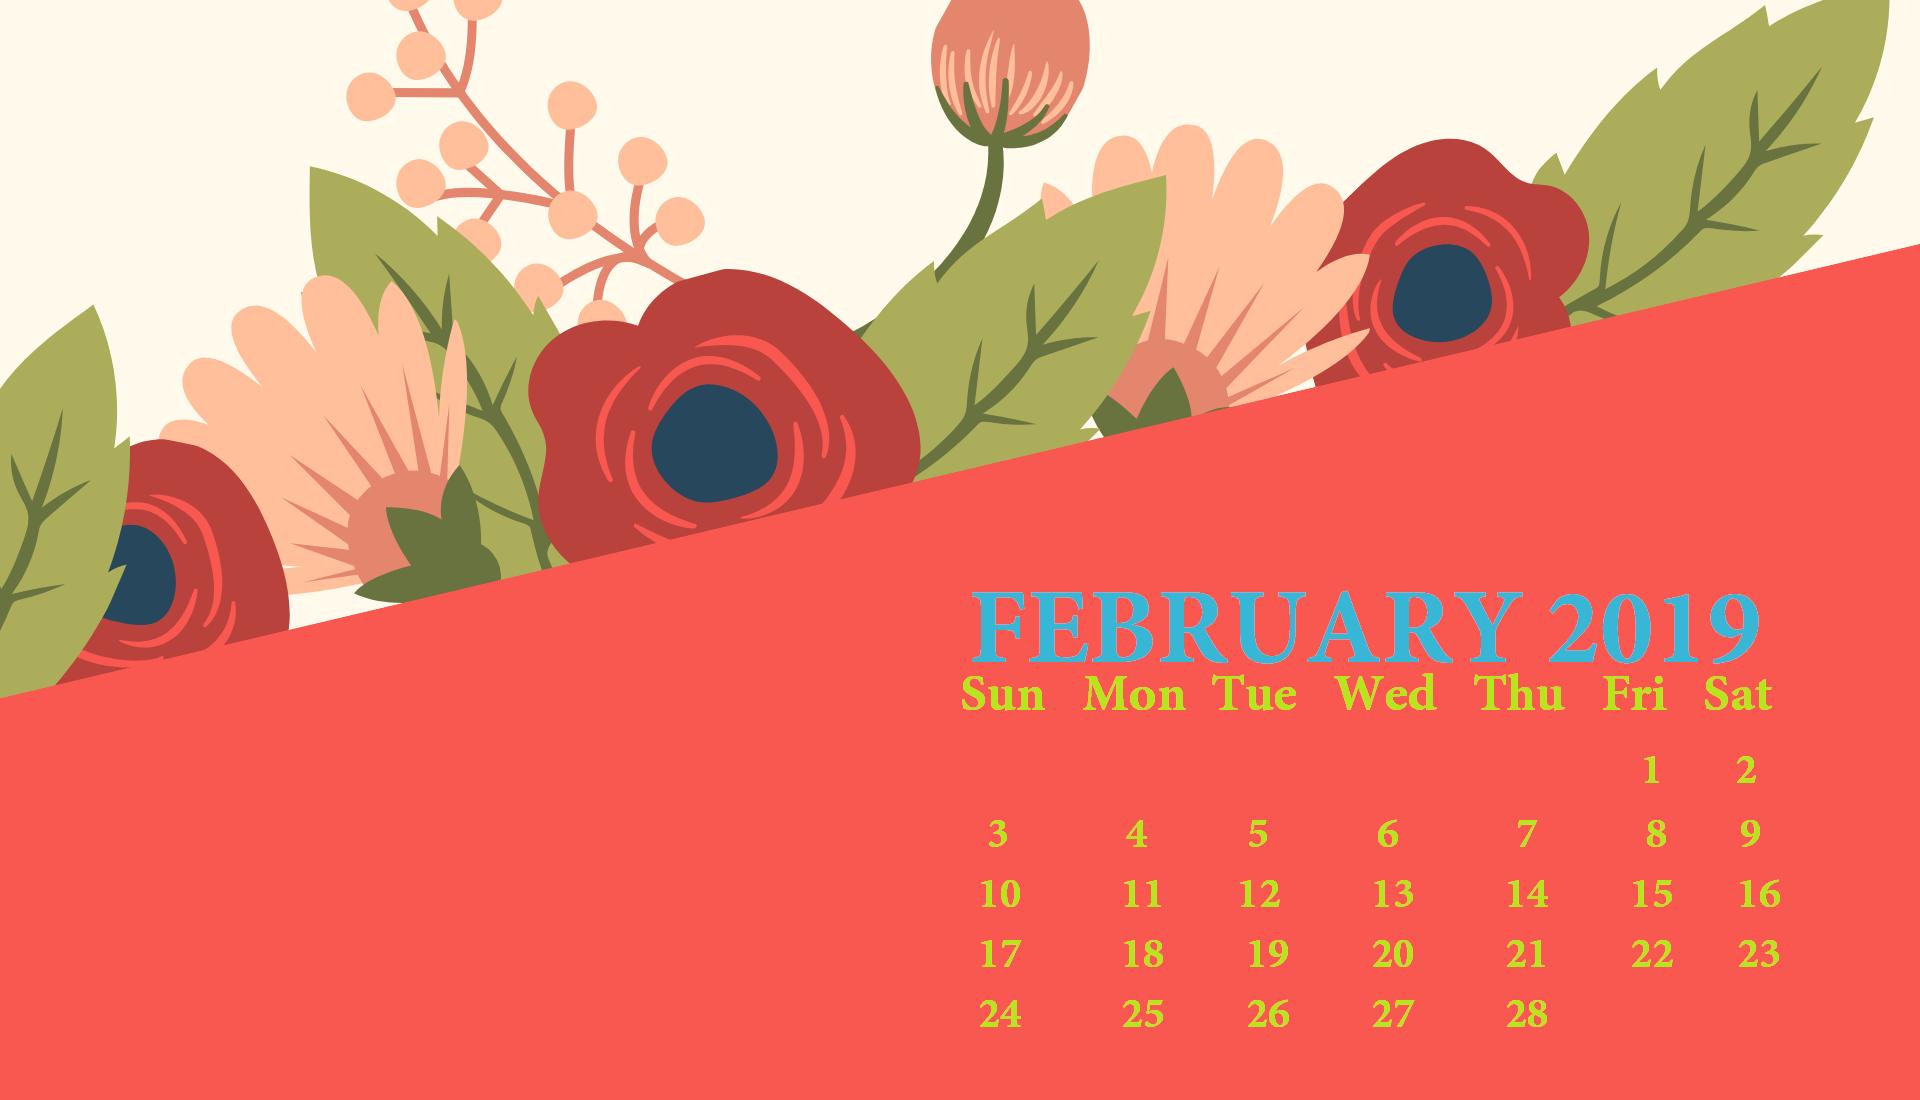 February 2019 Book It Calendar 2019 February HD Calendar Wallpaper   Wallpapers in 2019